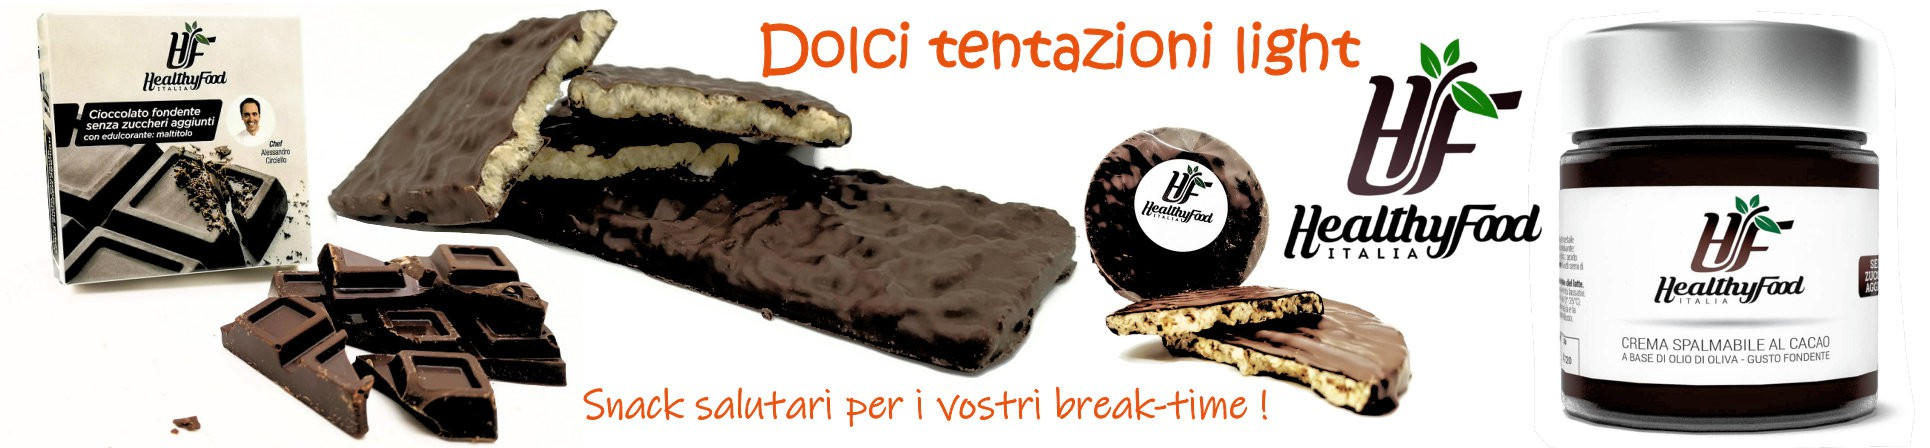 snack salutari vendita online snack dolci light - HEALTHY FOOD ITALIA